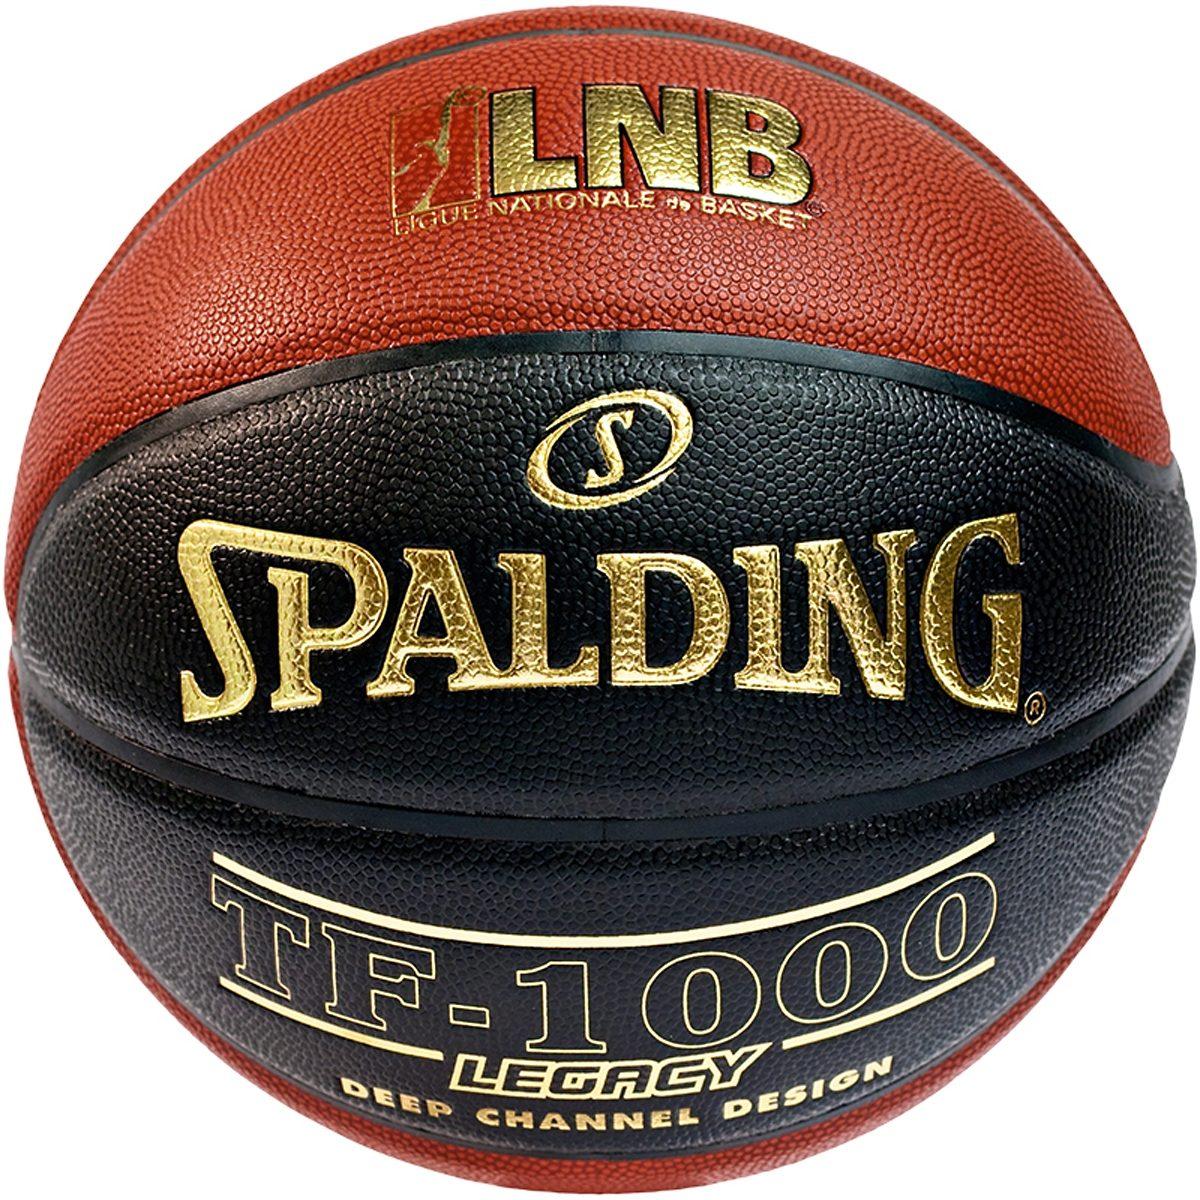 SPALDING LNB TF1000 Legacy FIBA Basketball